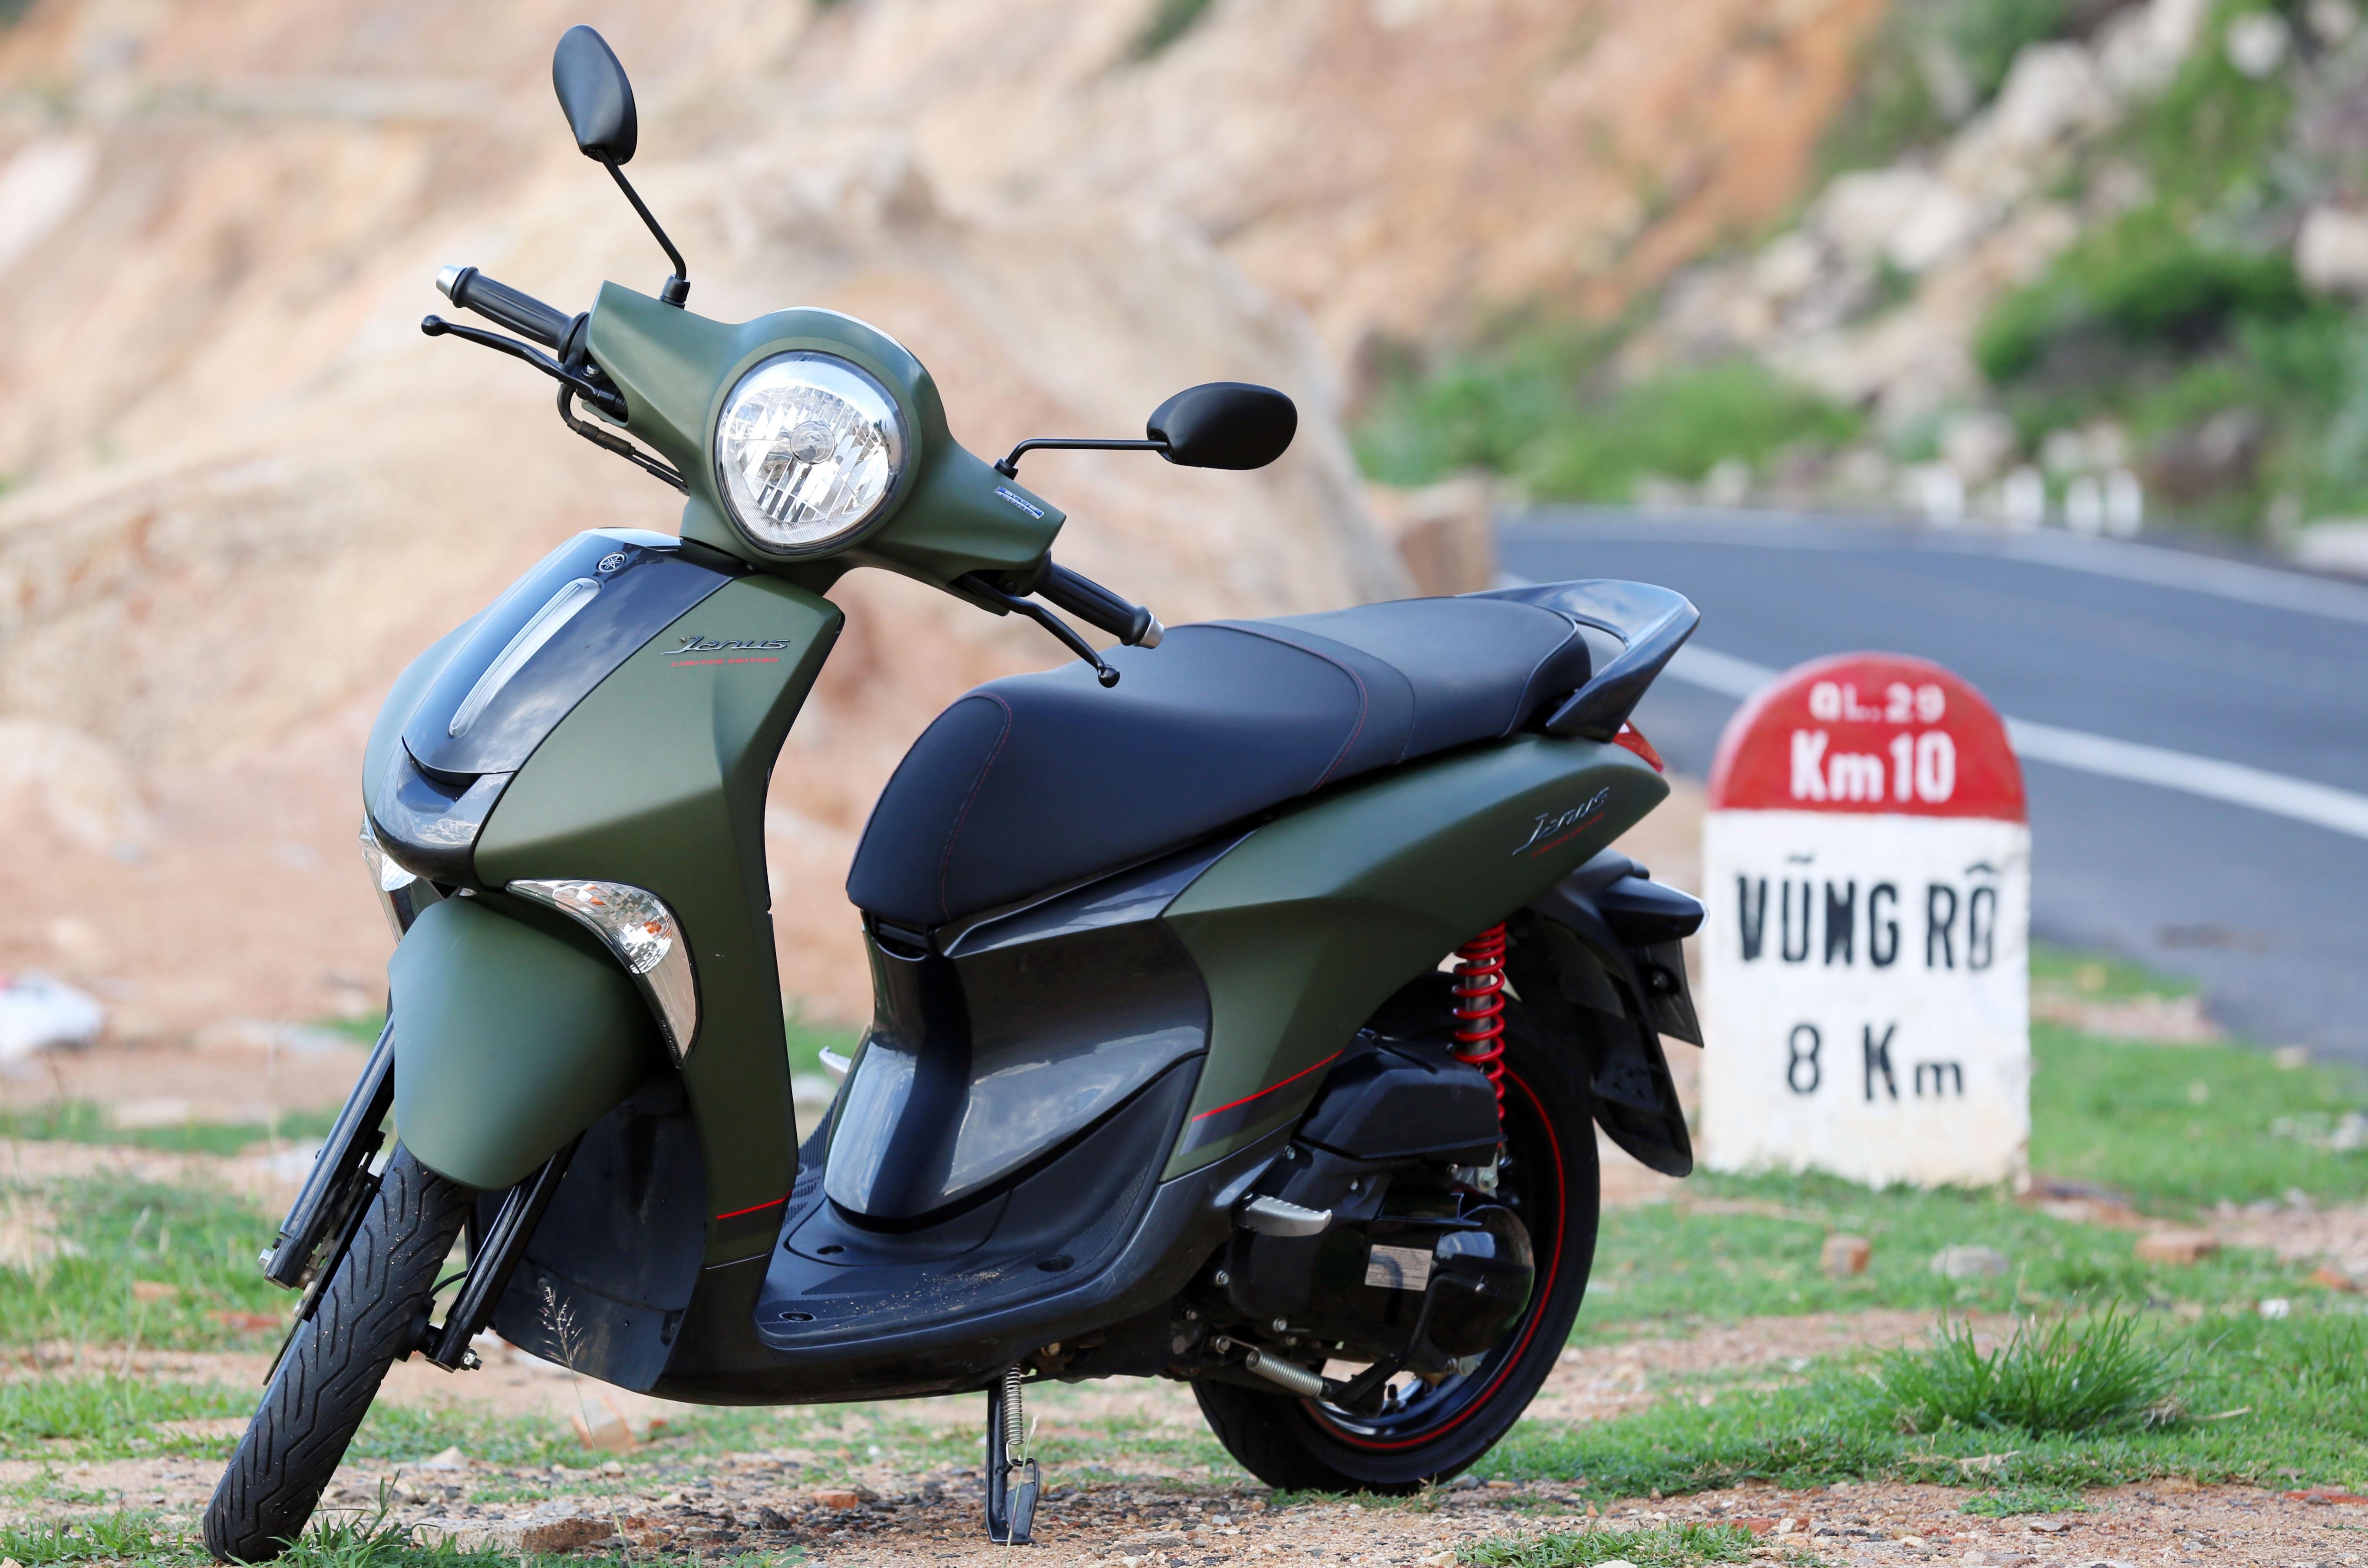 So sanh Honda Scoopy 2021 va Yamaha Janus anh 2